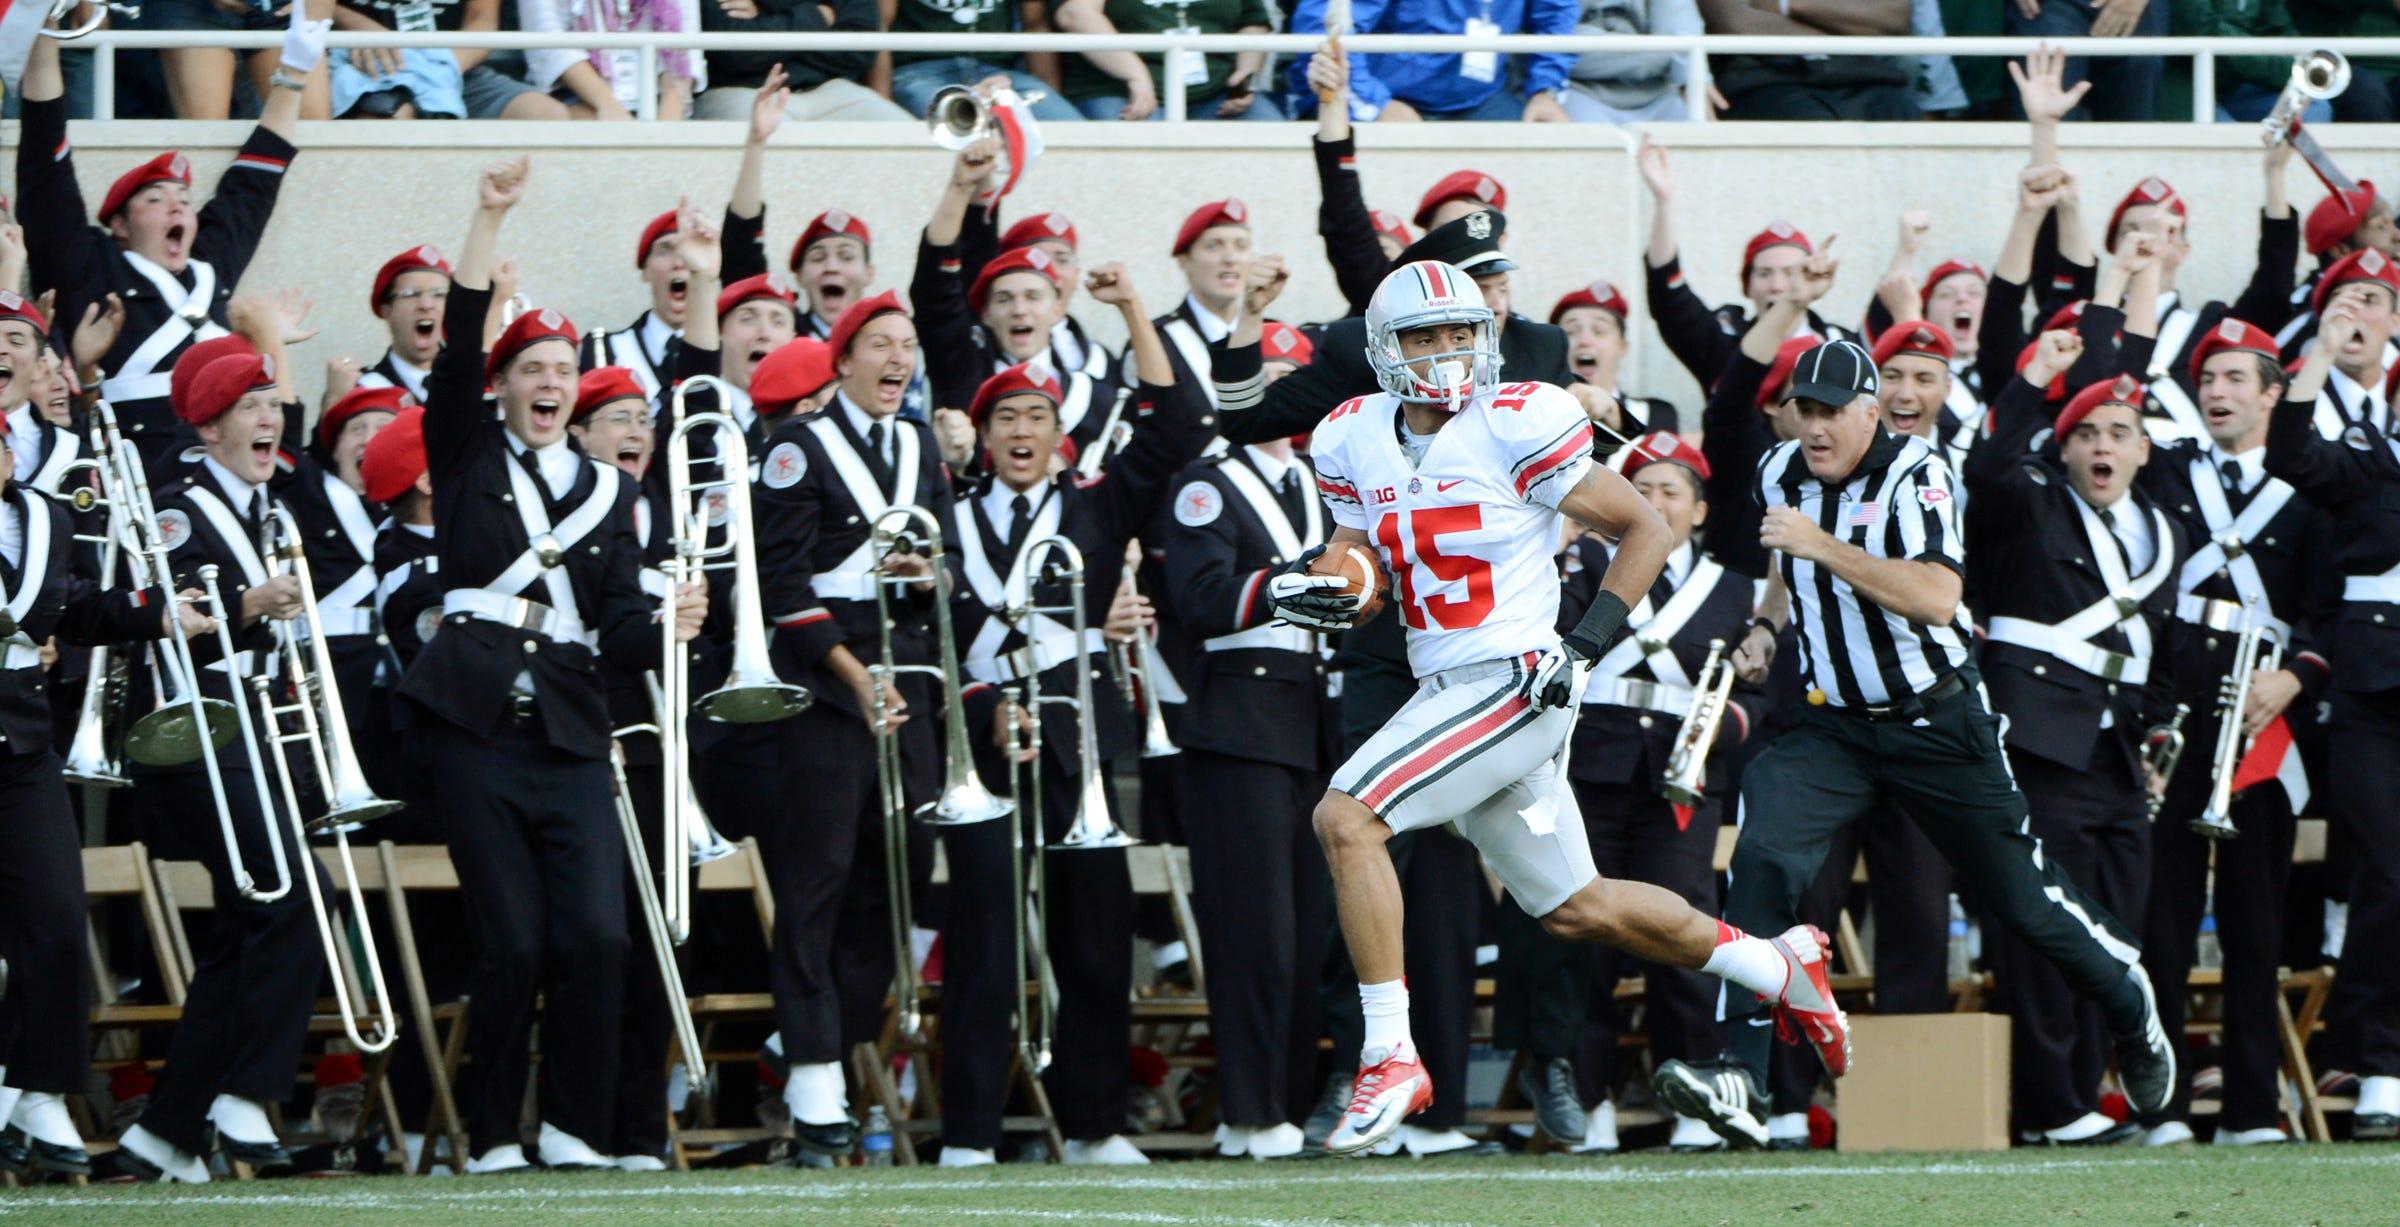 Ohio State Buckeyes wide receiver Devin Smith (15)  runs to endzone  at Spartan Stadium, September 29, 2012.